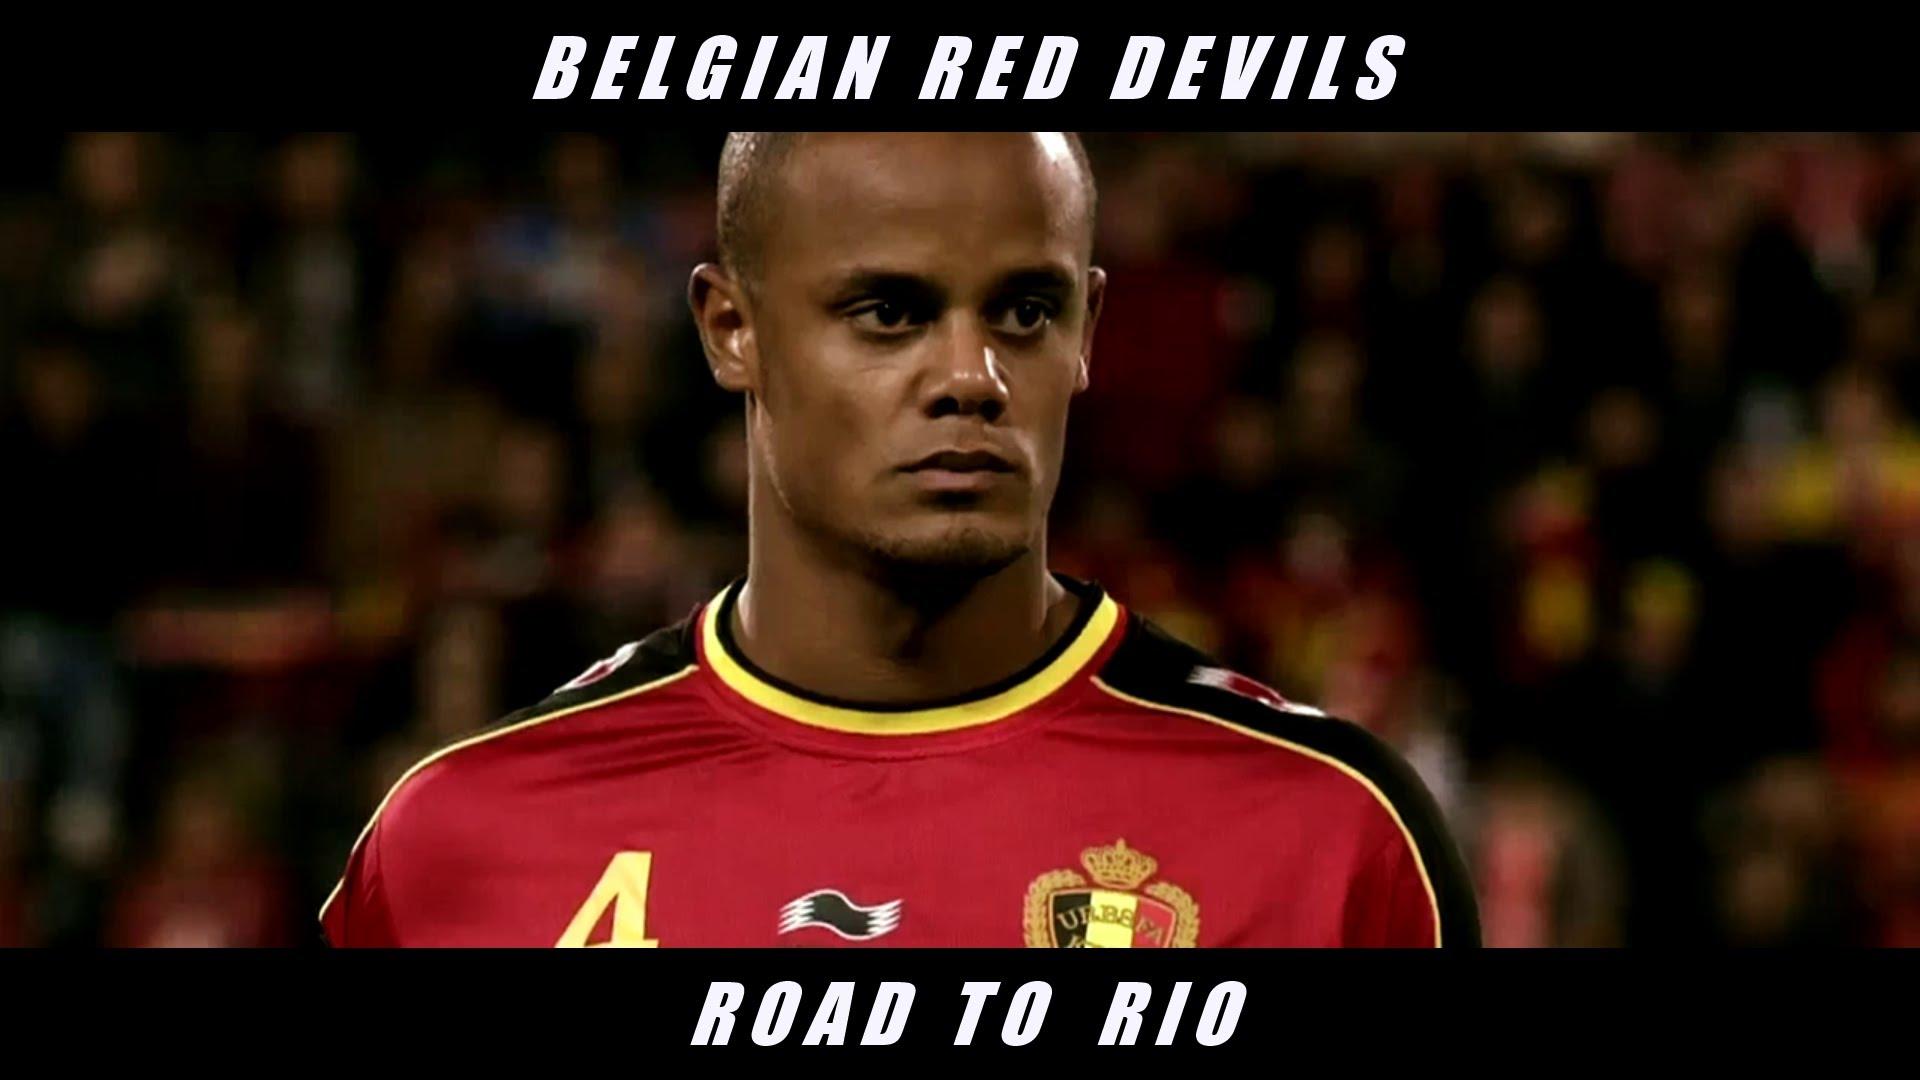 Belgium 2014 World Cup